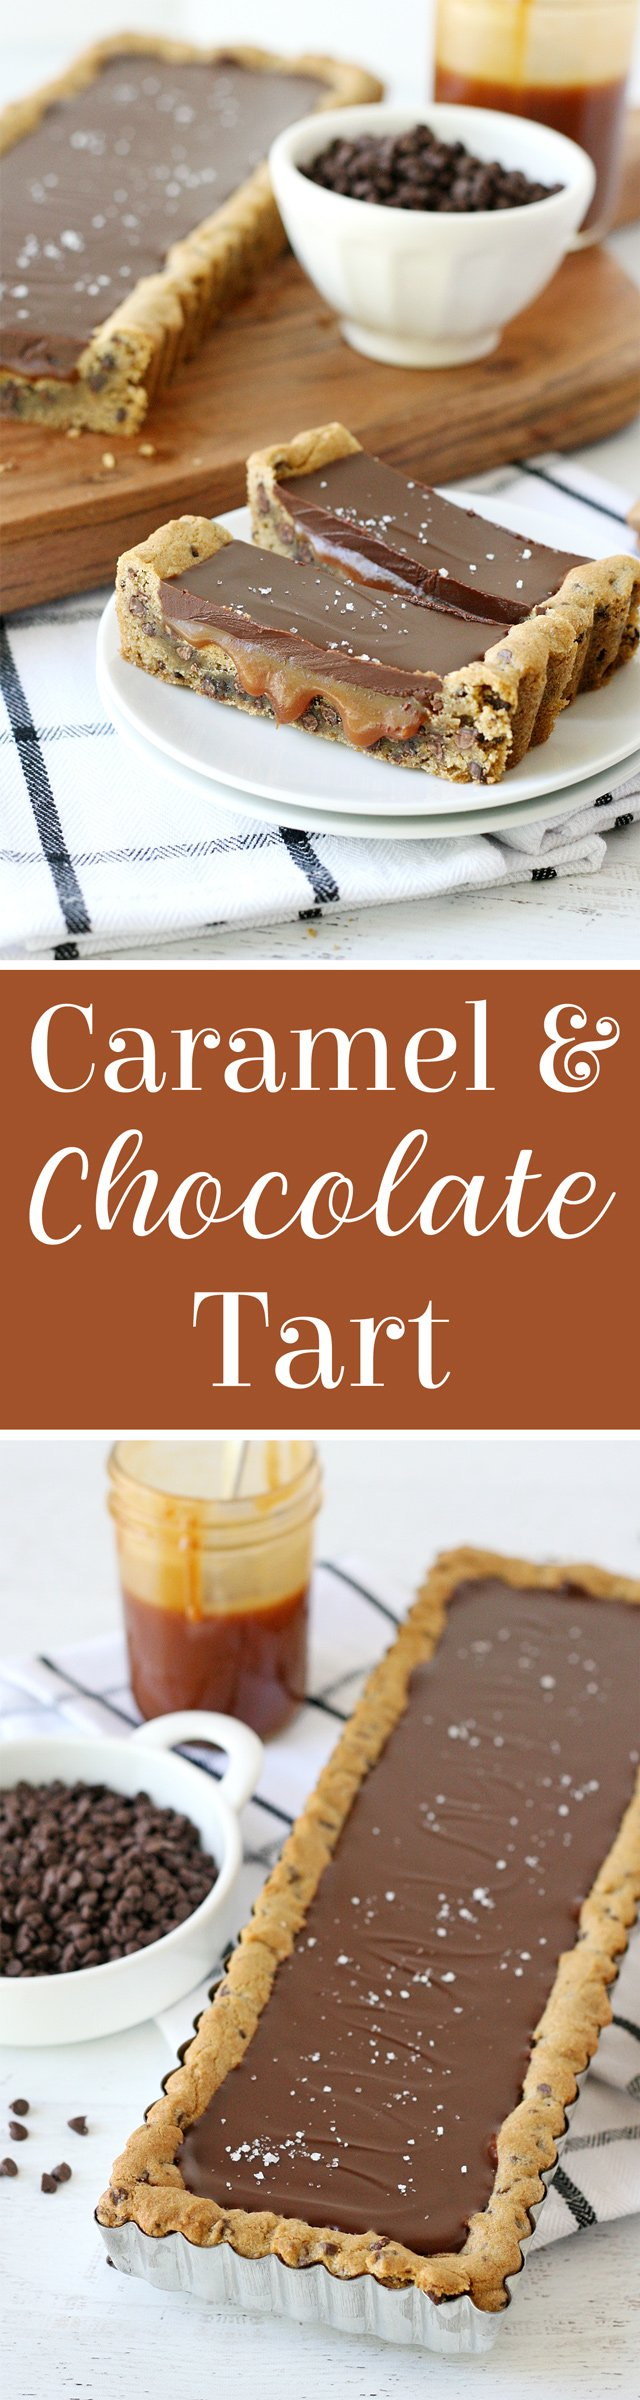 Chocolate Chip Salted Caramel Tart